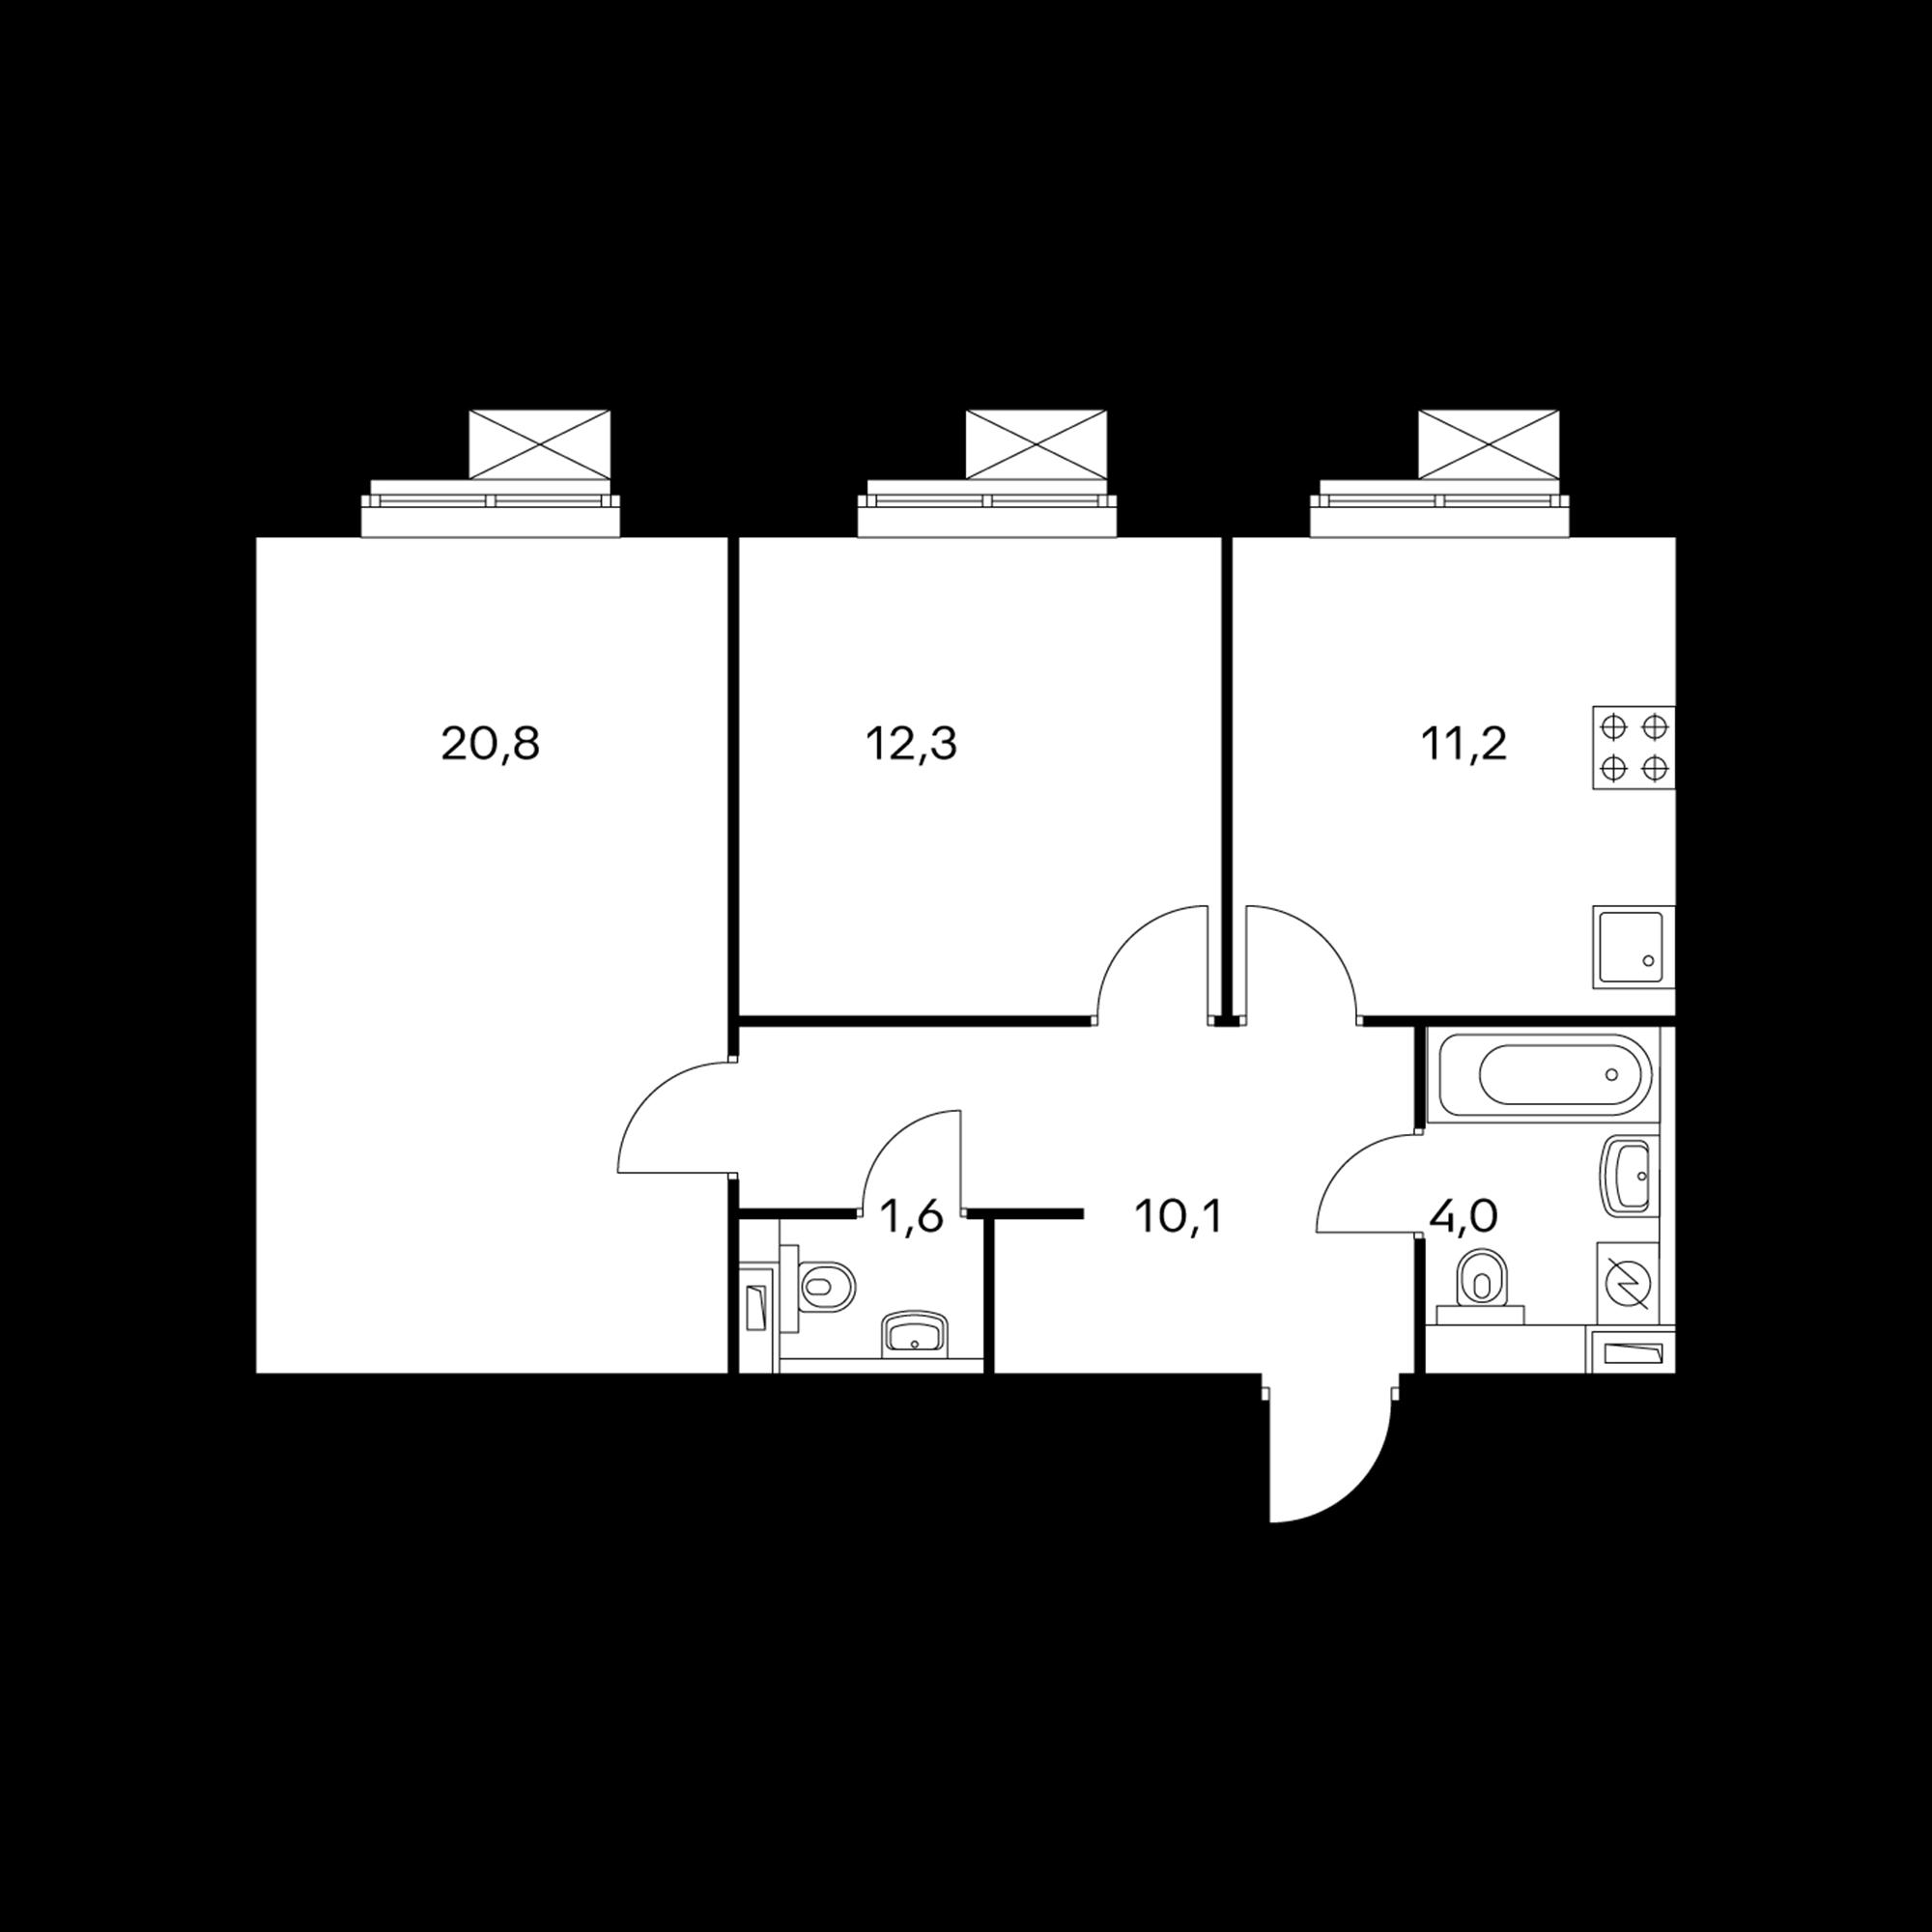 2KM6_10.5-1